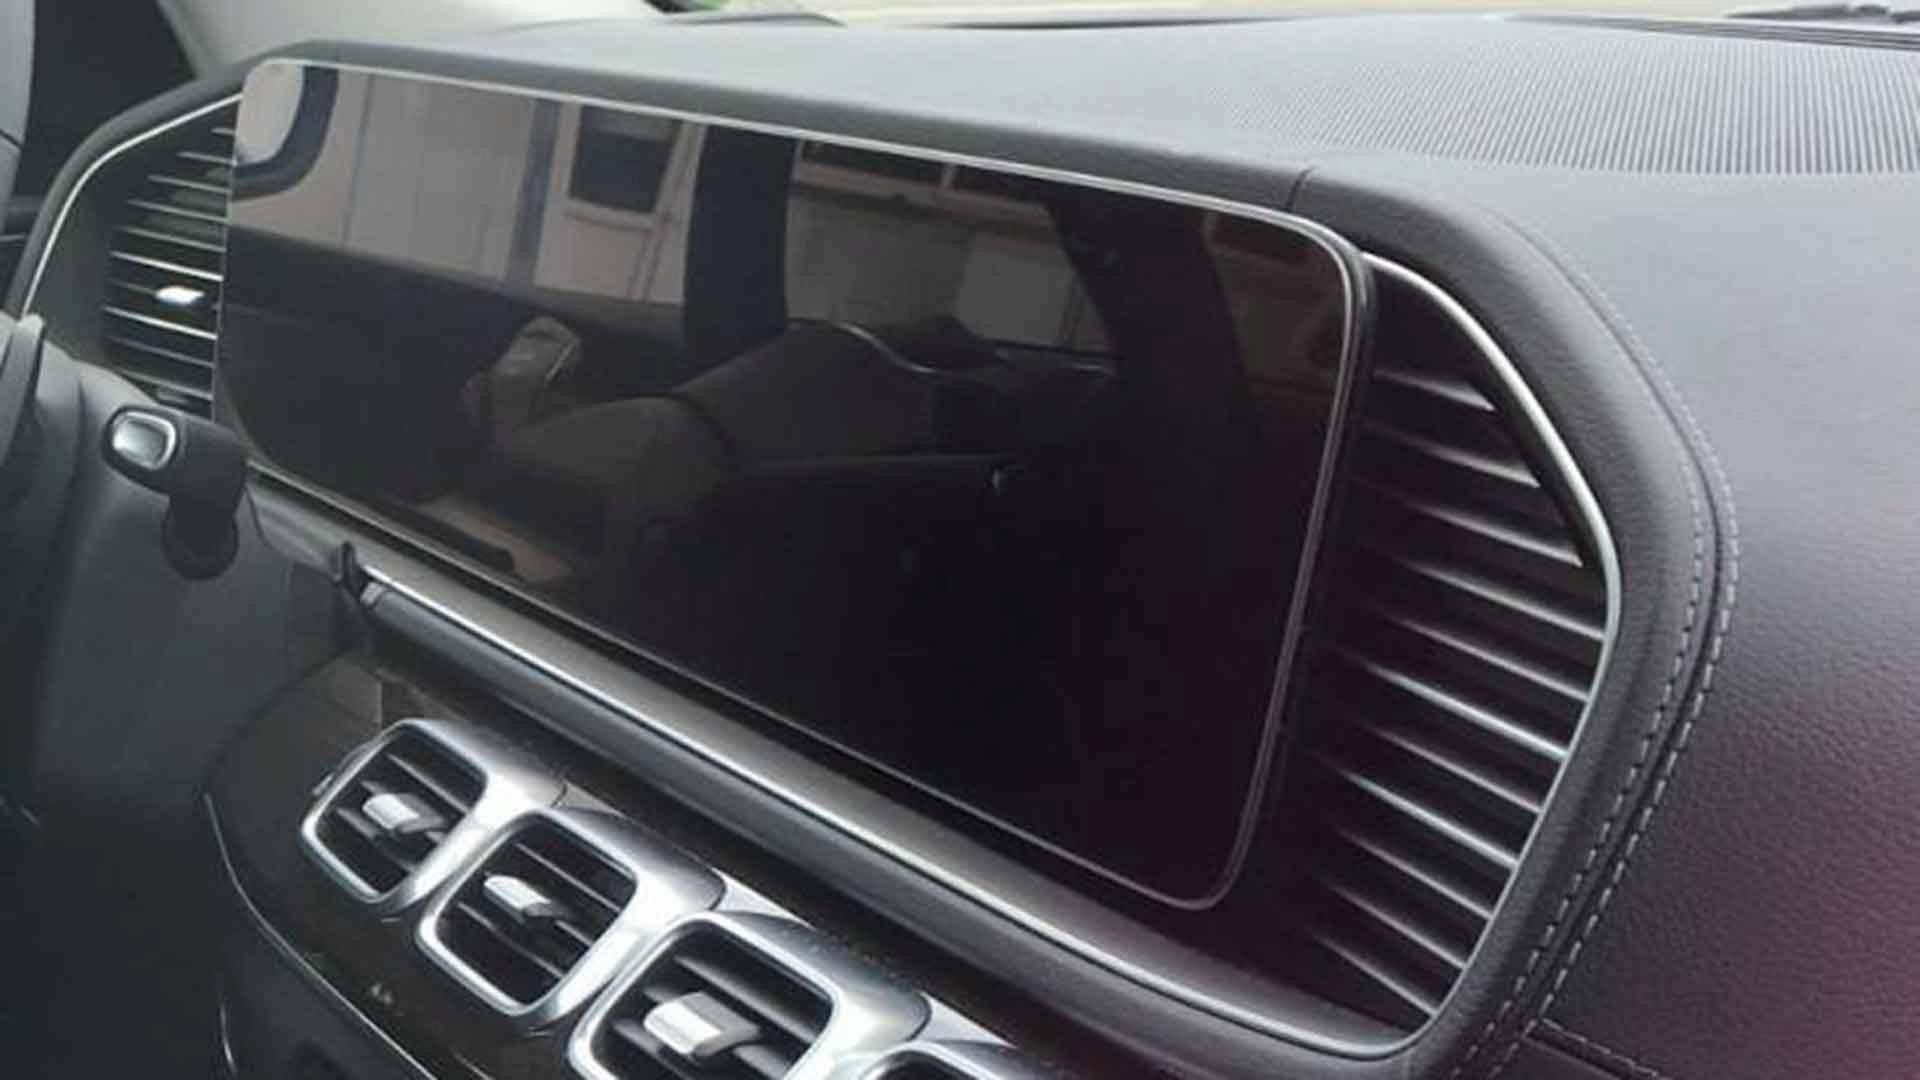 2019 Mercedes GLE Interior Revealed In Spy Shots